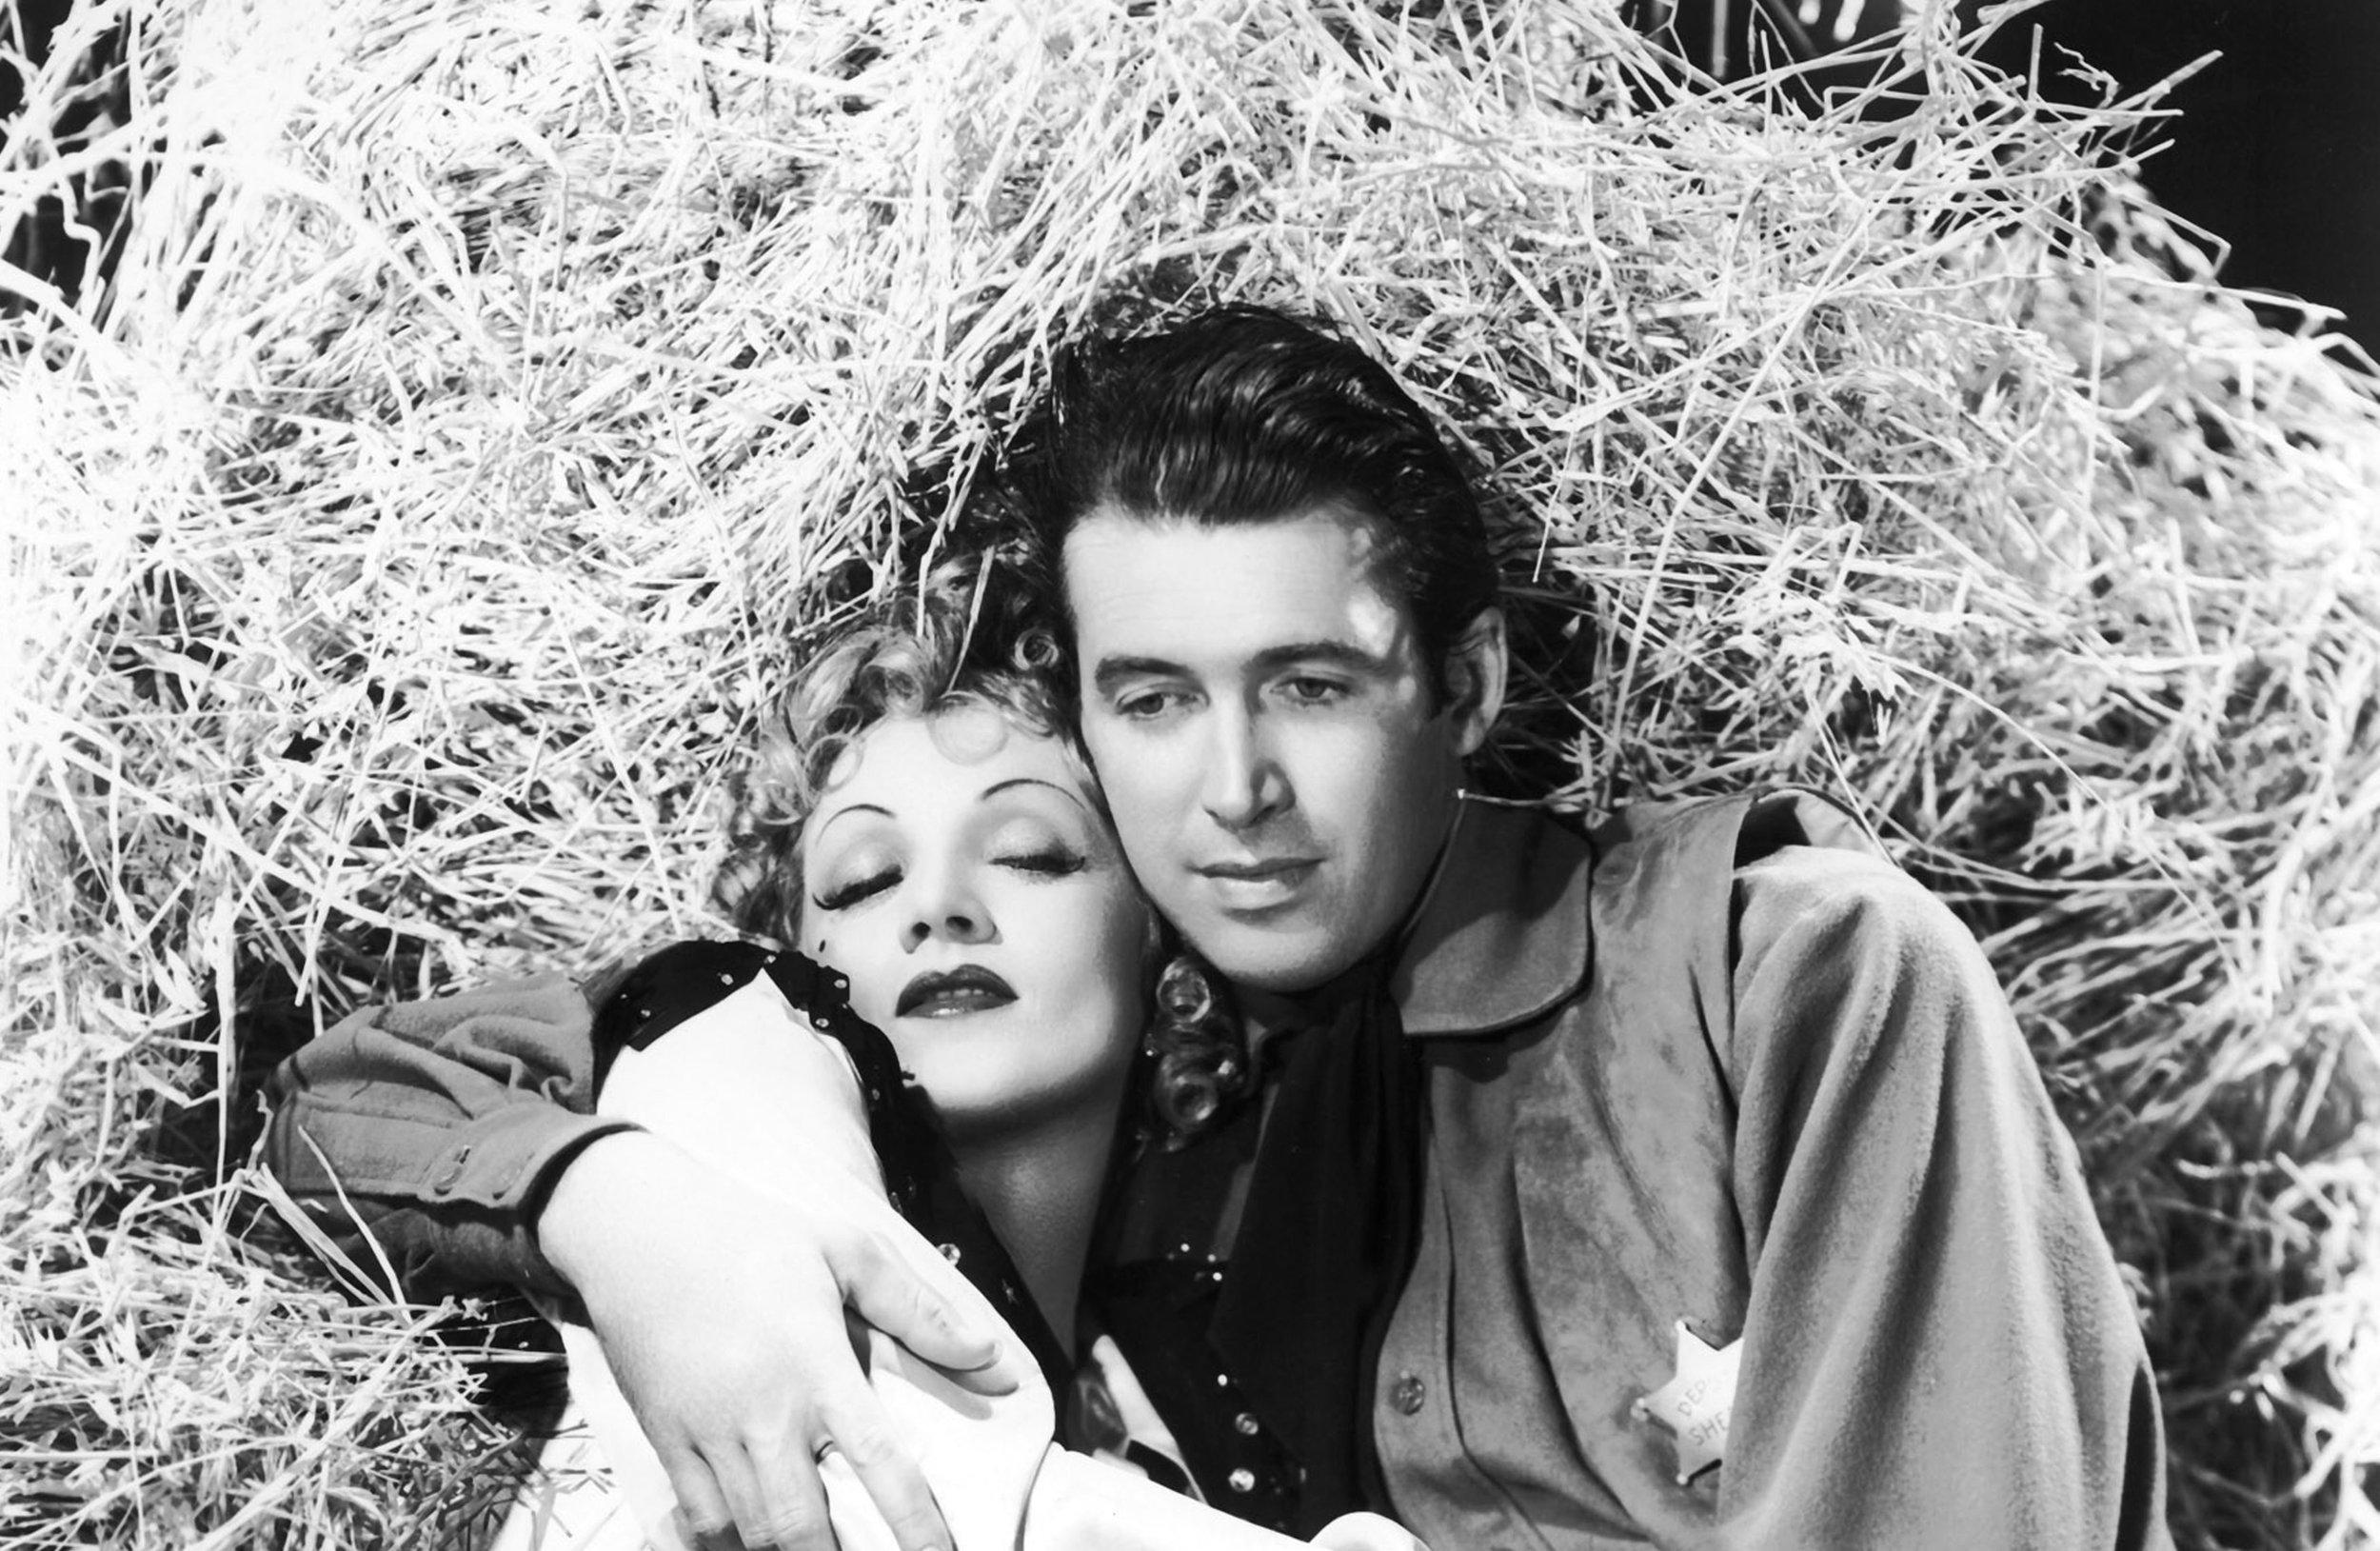 #35) Destry Rides Again - (1939 - dir. George Marshall)